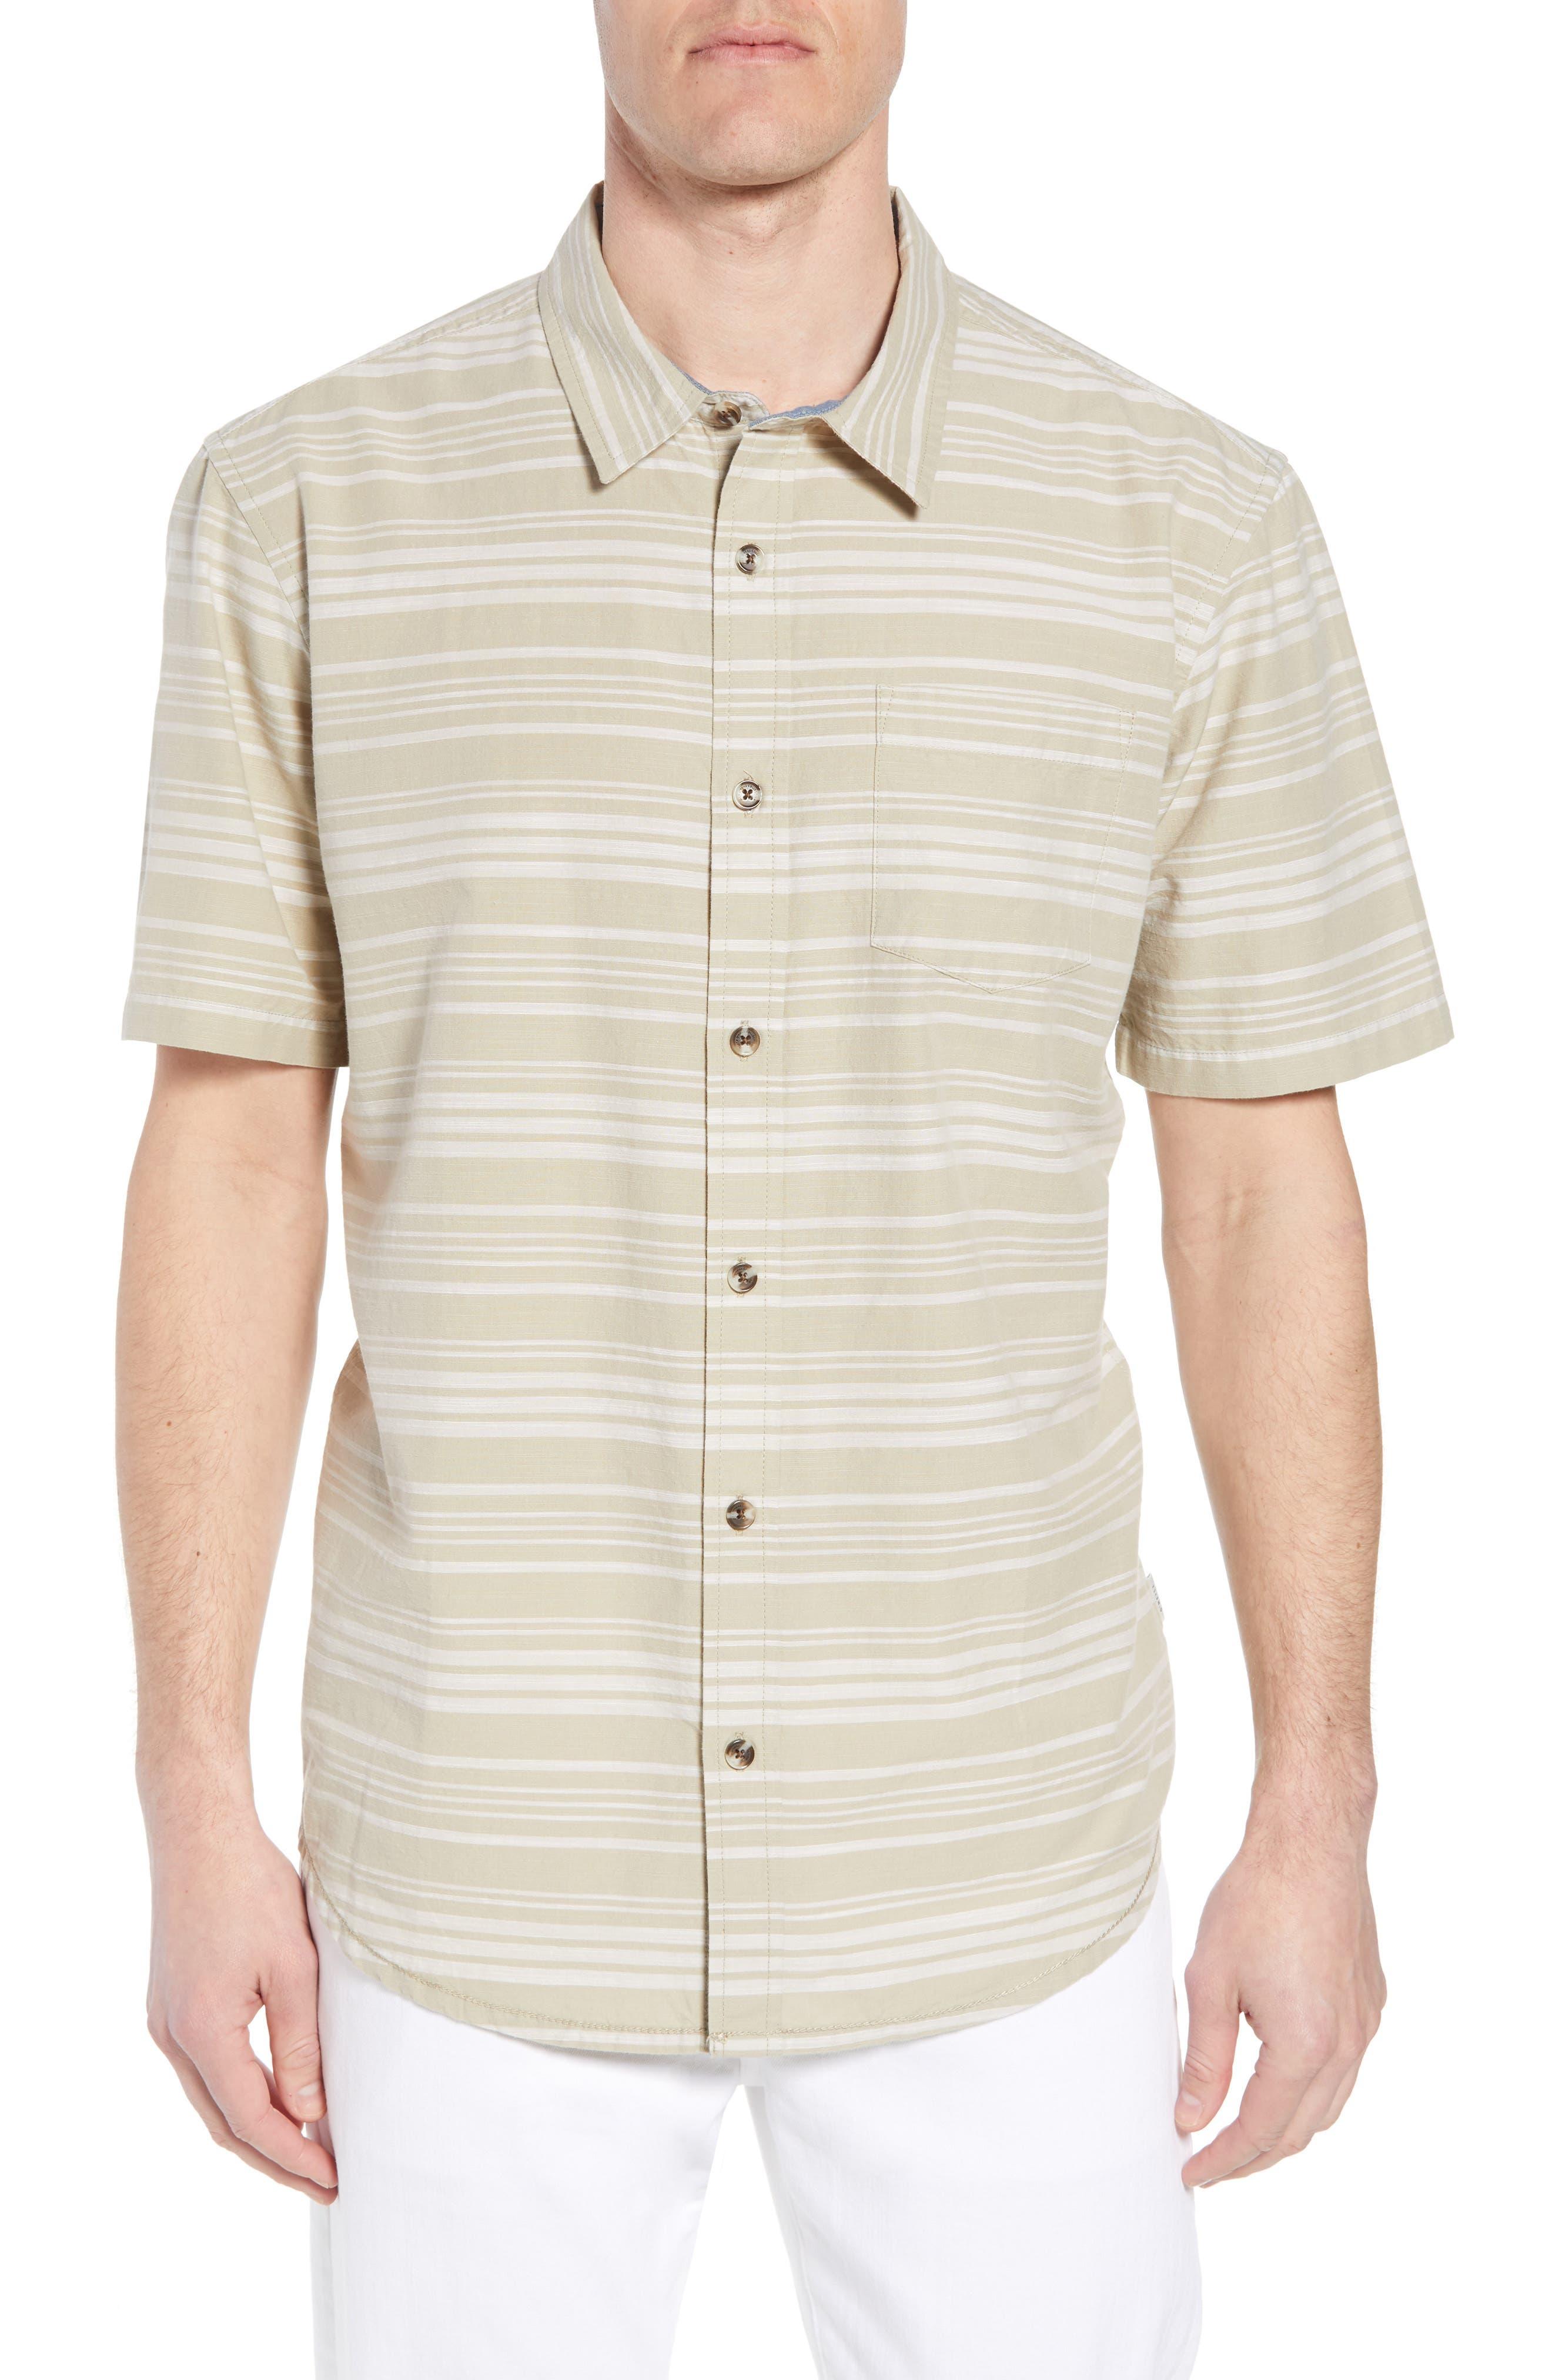 Alternate Image 1 Selected - Jack O'Neill Line Up Sport Shirt